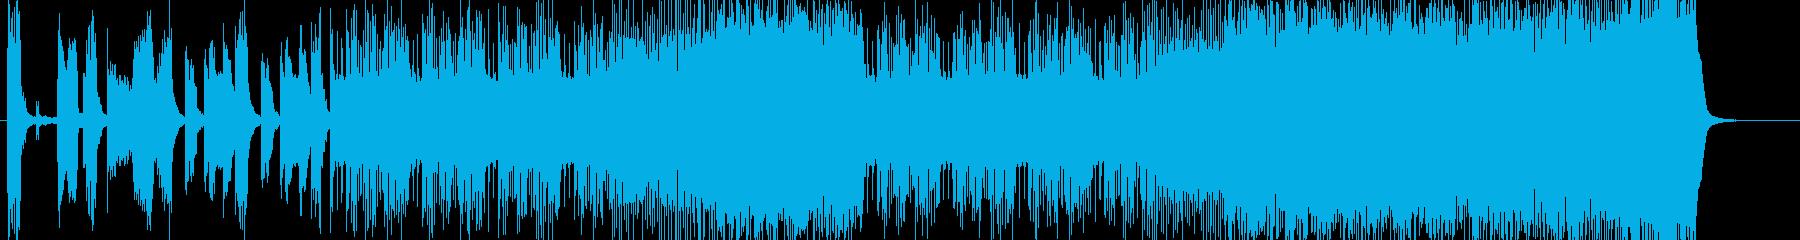 DEATHMETAL、DEATHCOREの再生済みの波形